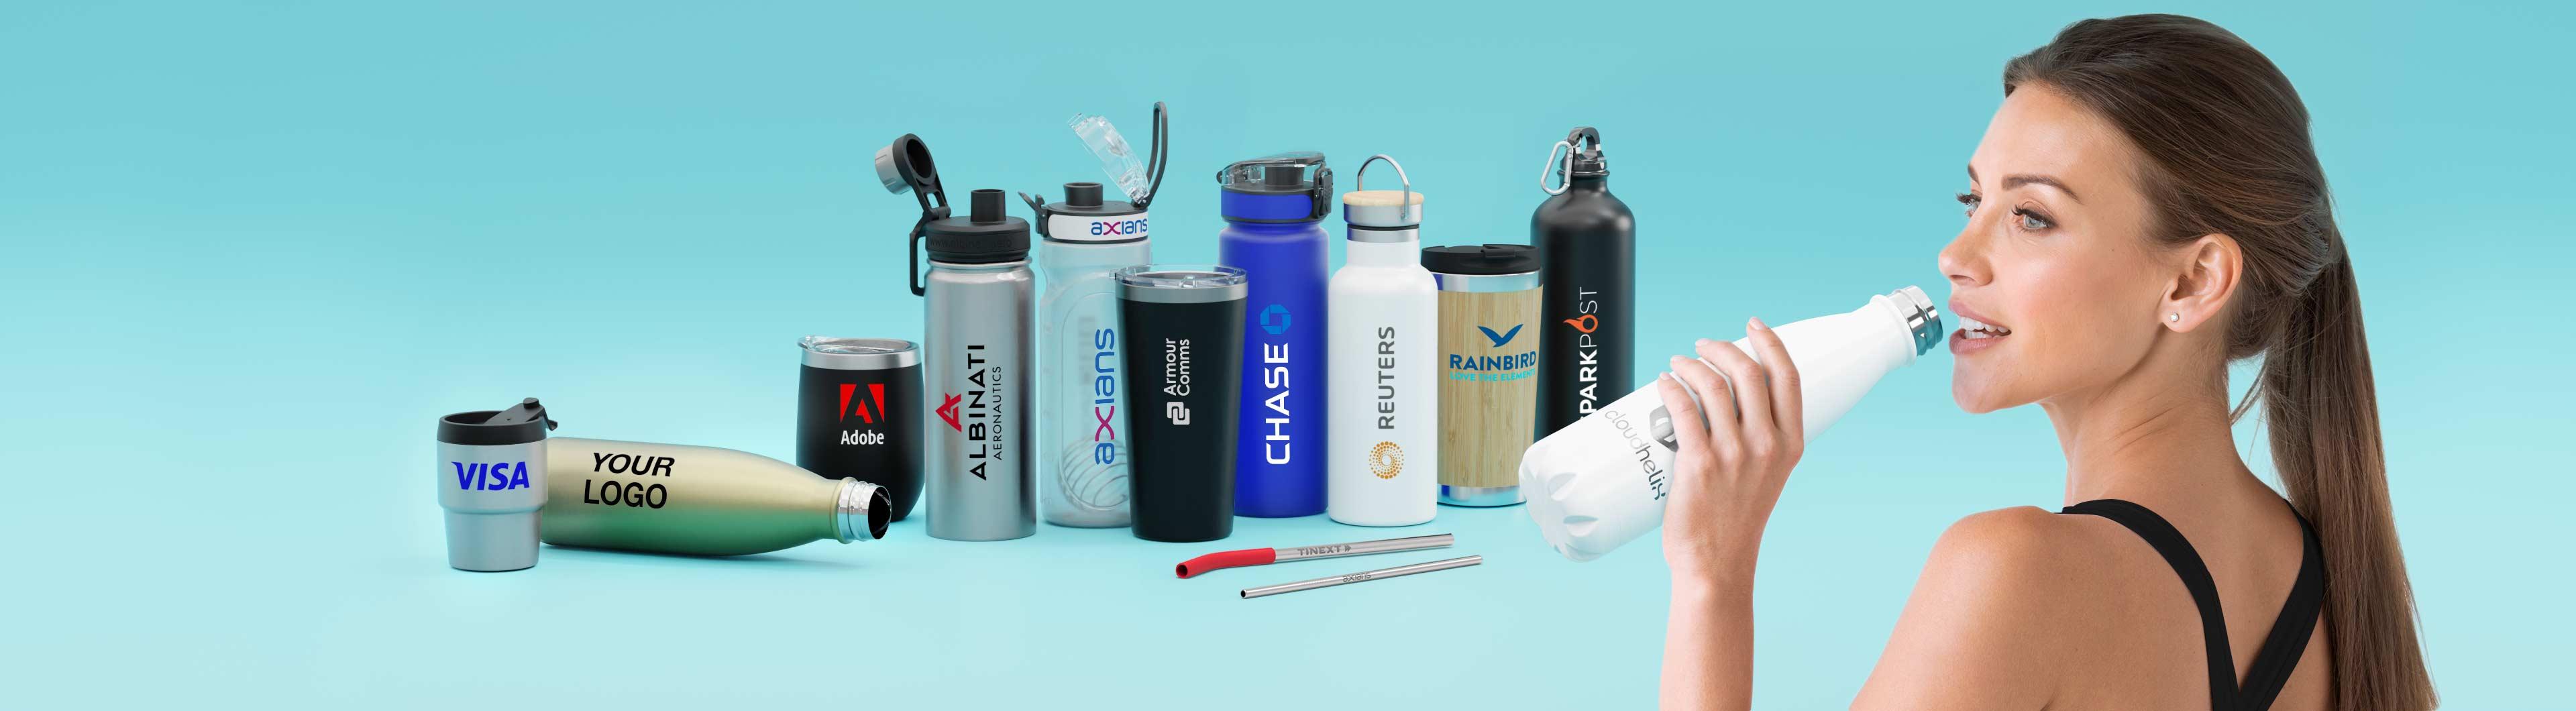 Flasky - Custom Water Bottles